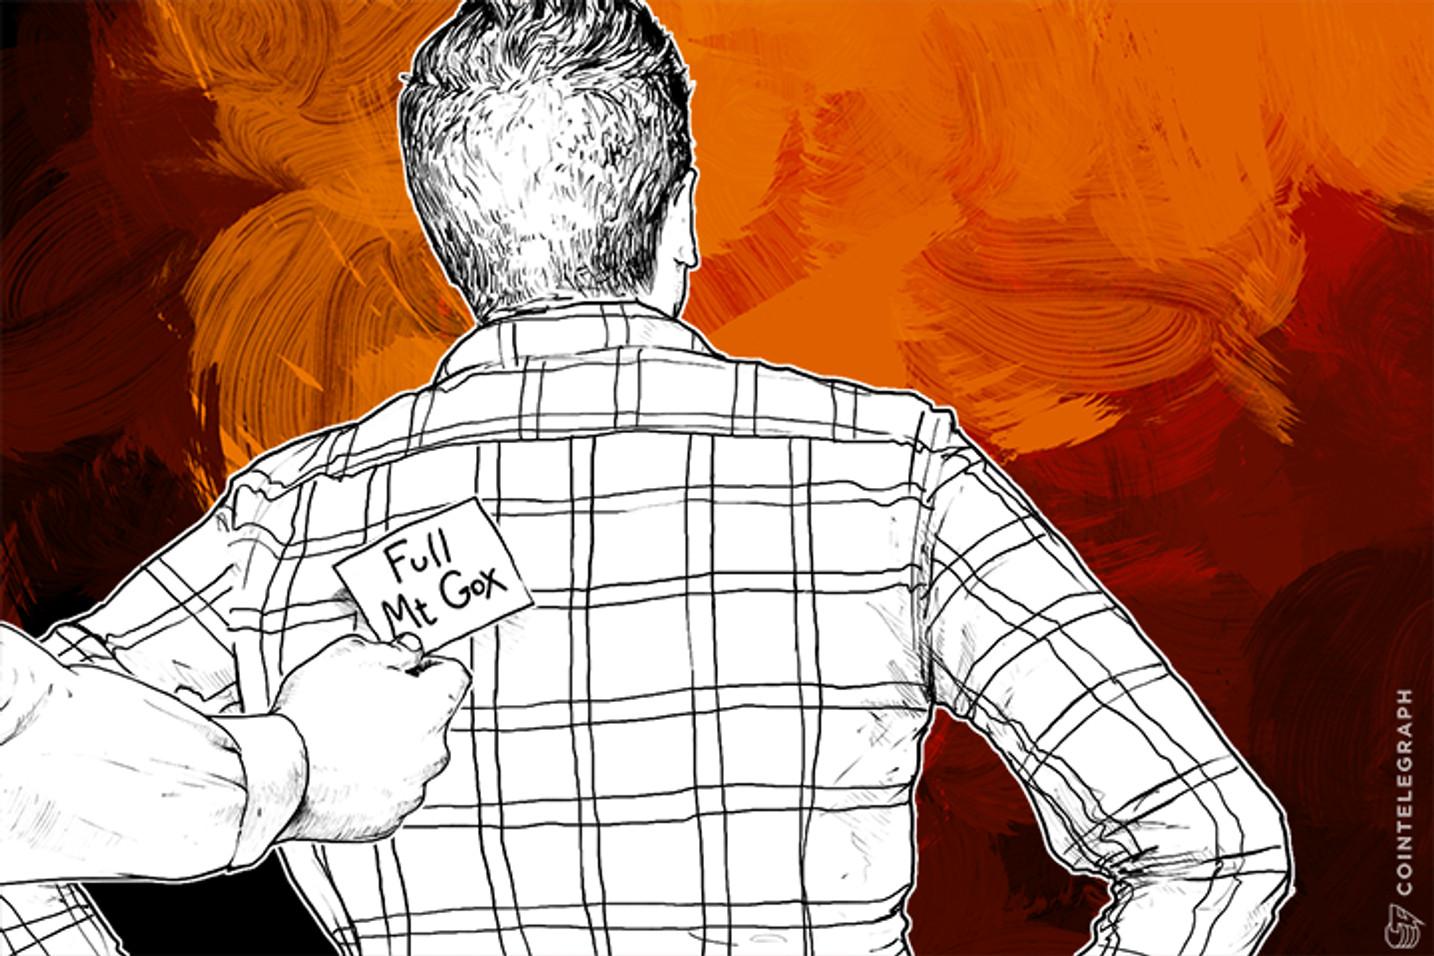 Paybase's Josh Garza Refutes Mt Gox Allegation as 'Aggressive Claim' Following Week-Long Funds Freeze